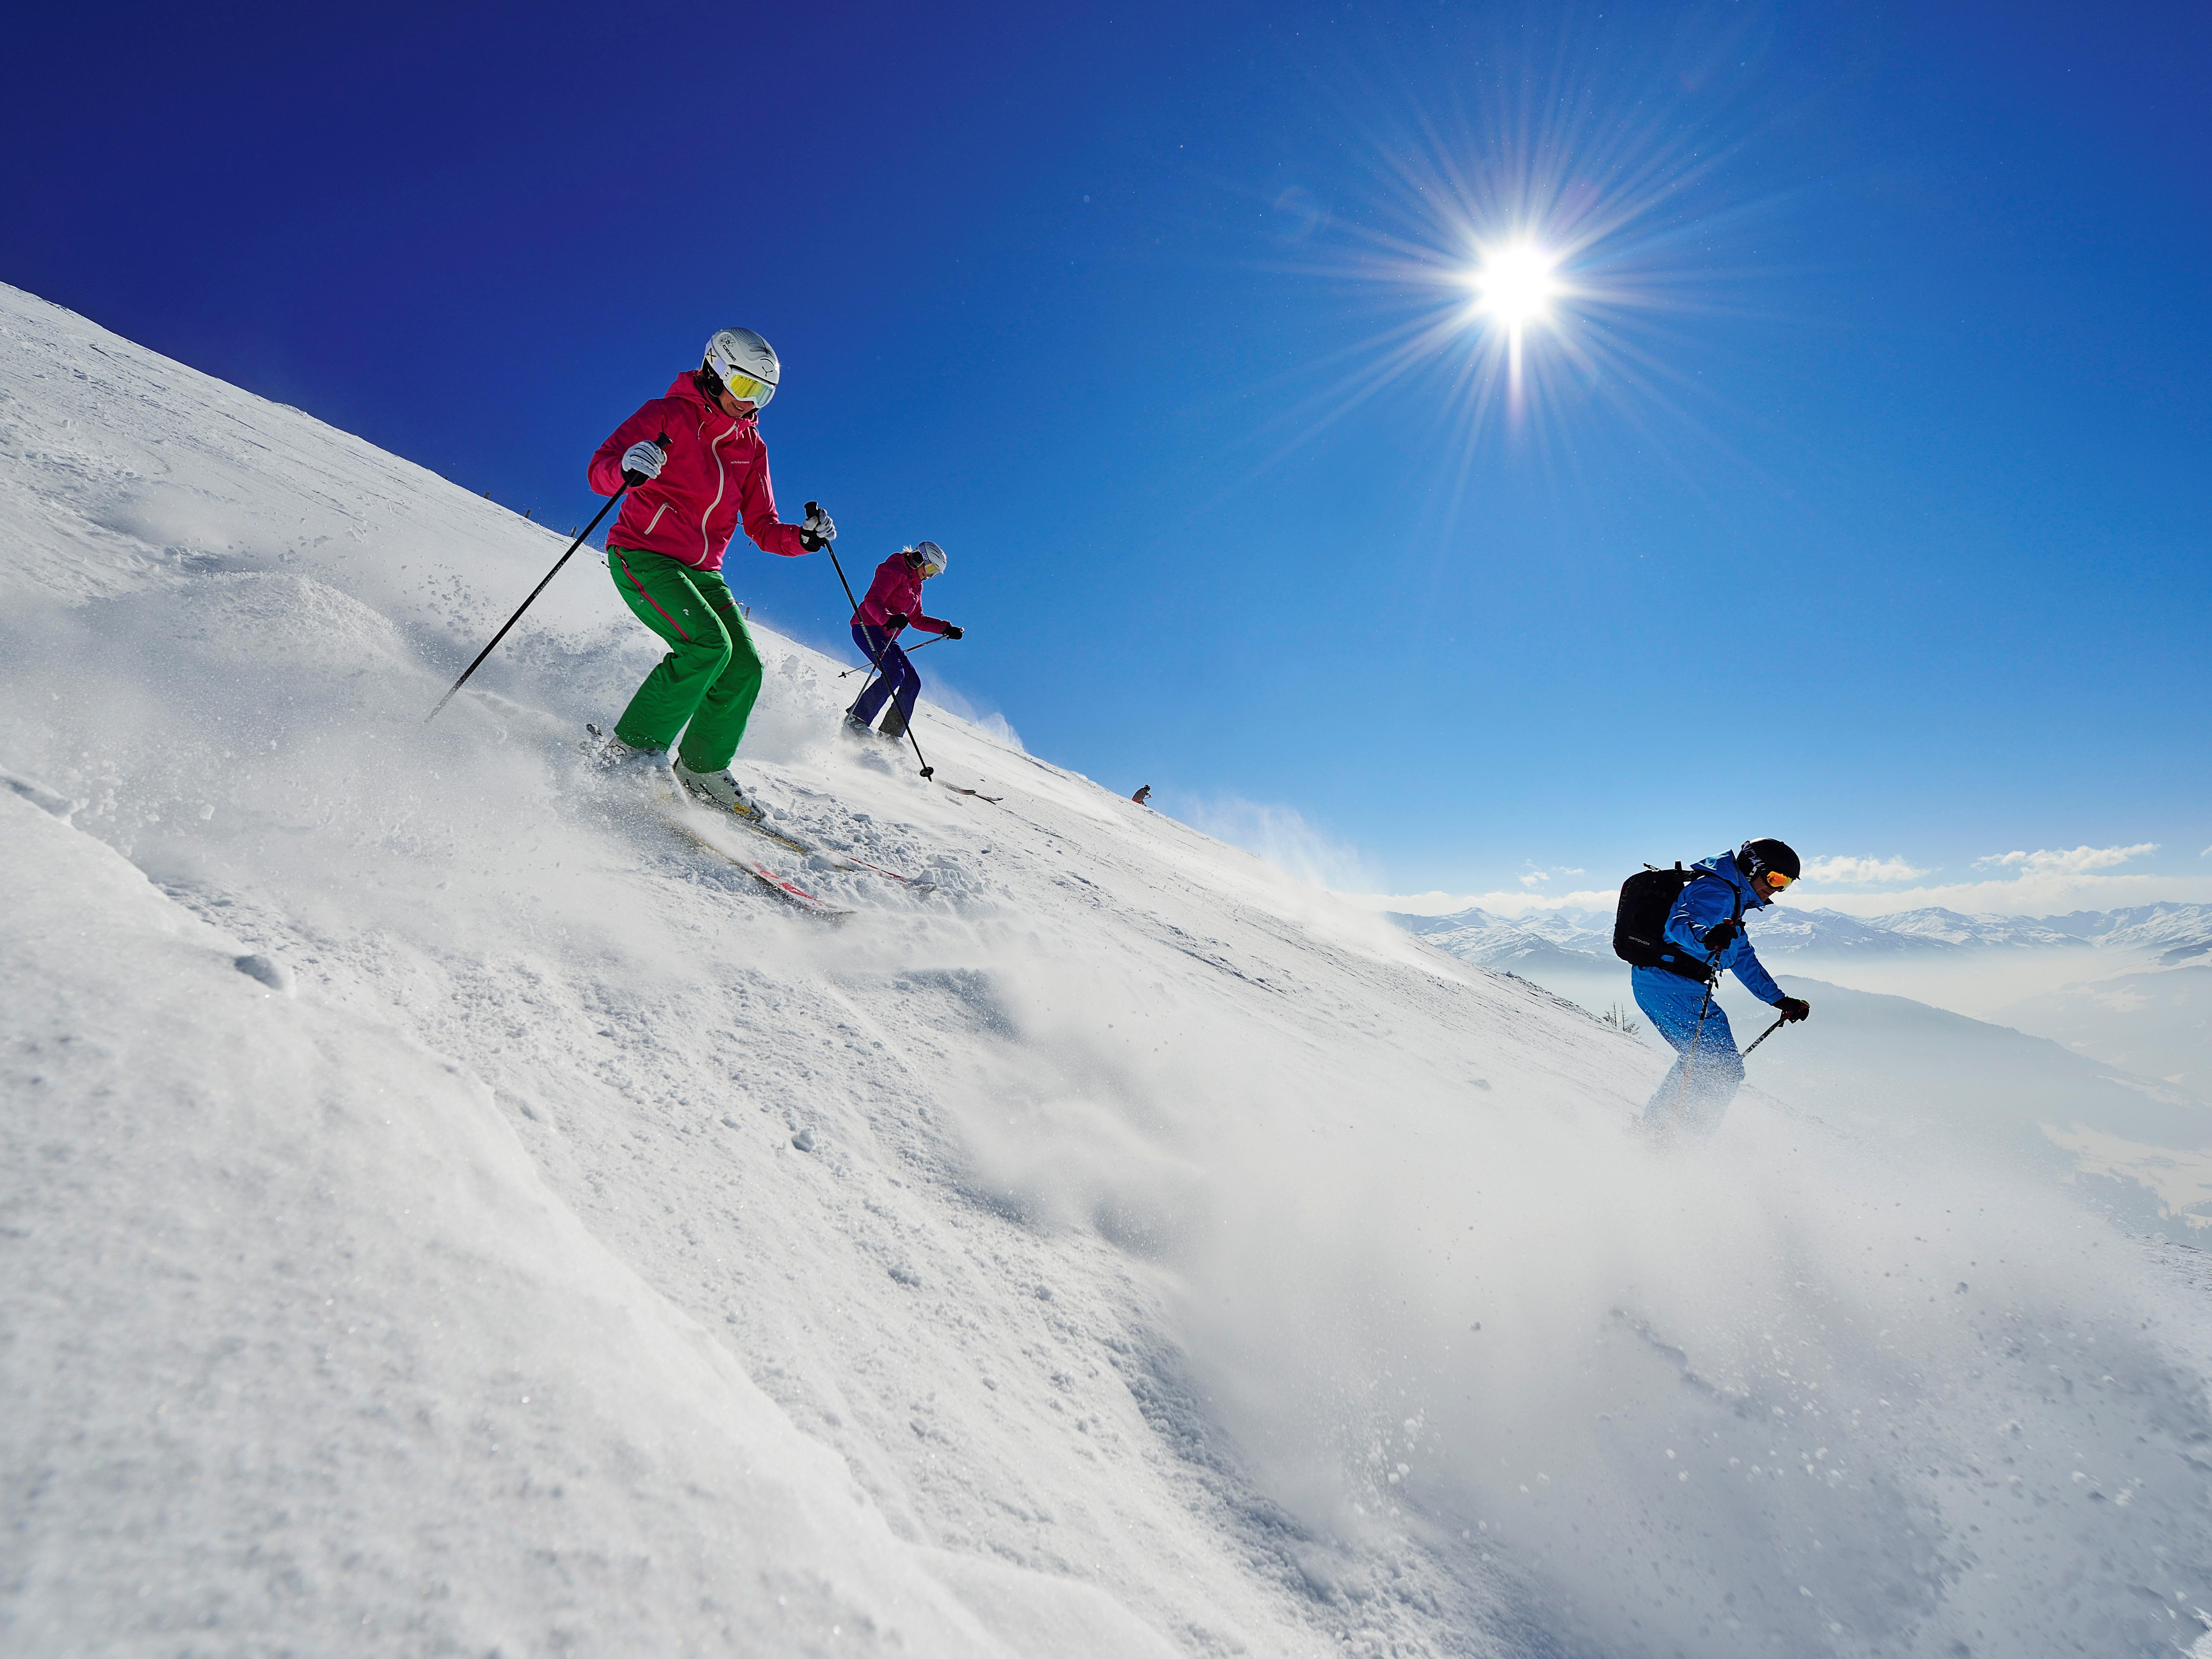 Hohe Salve Kitzbüheler Alpen Skisafari exklusiv